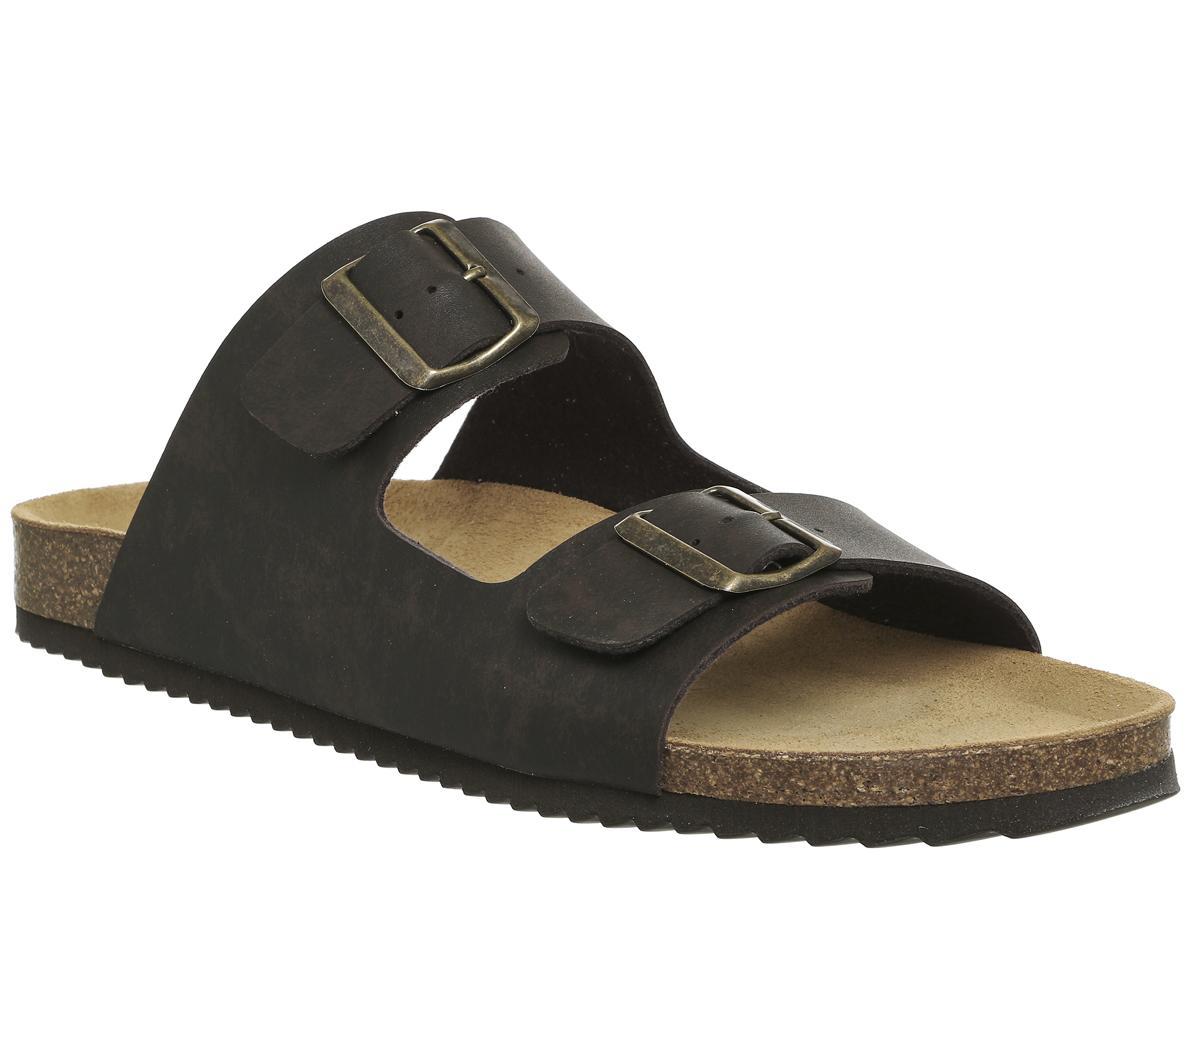 Dubai Buckle Sandals